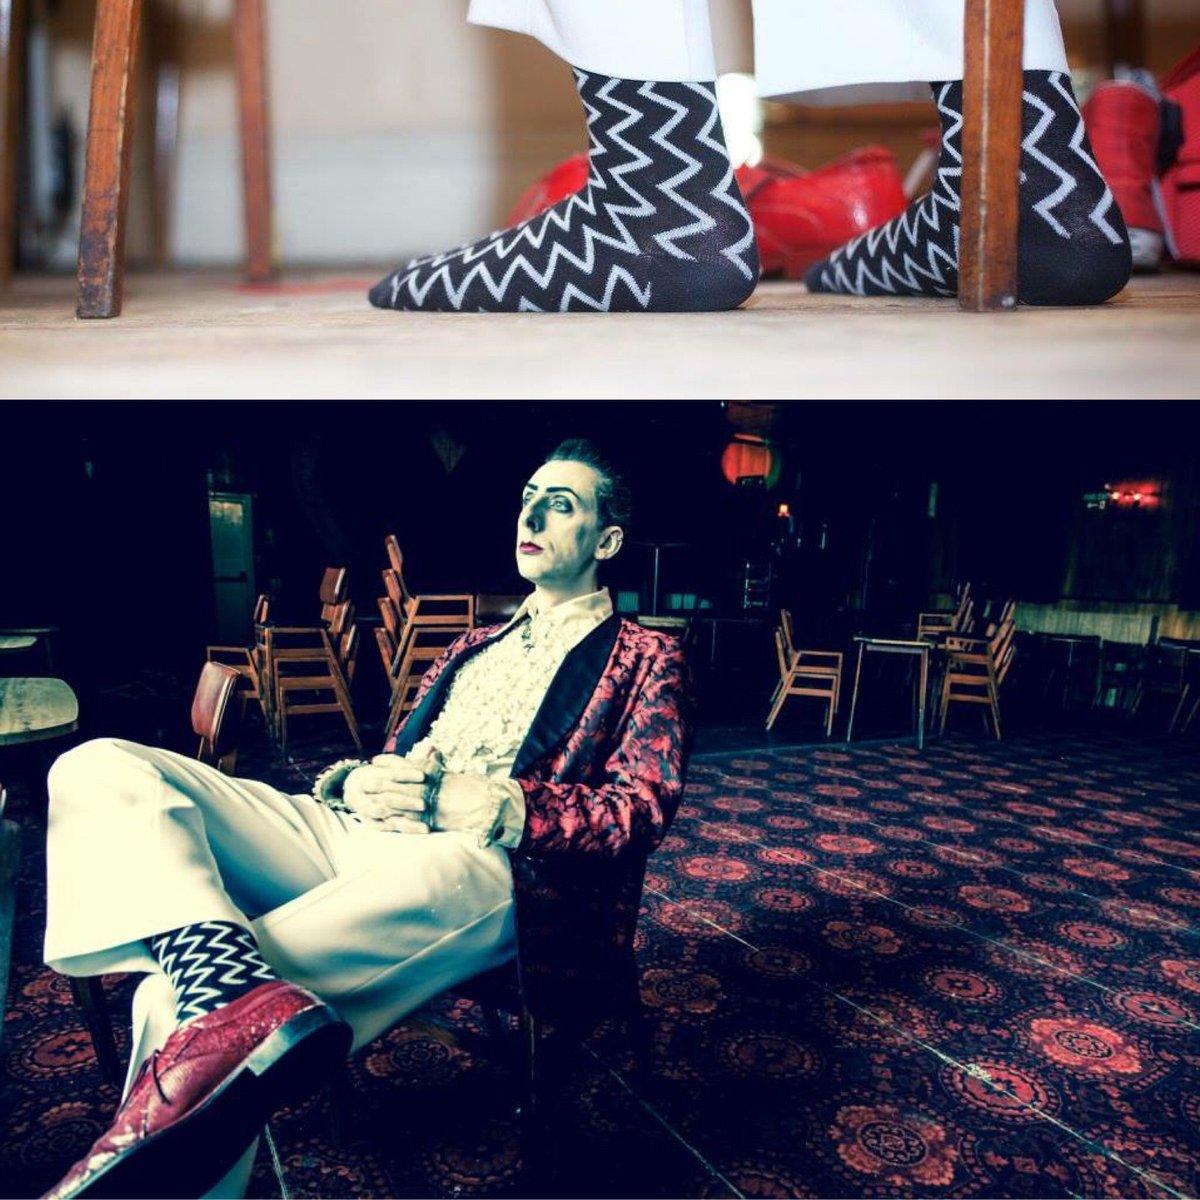 We've plenty of Benjamin Louche approved socks in The Double R Club shop if you want to give your feet a treat!    @sofuckinsuave #twinpeaks #socks #lockin #letterboxgift #lynchian #rrclub